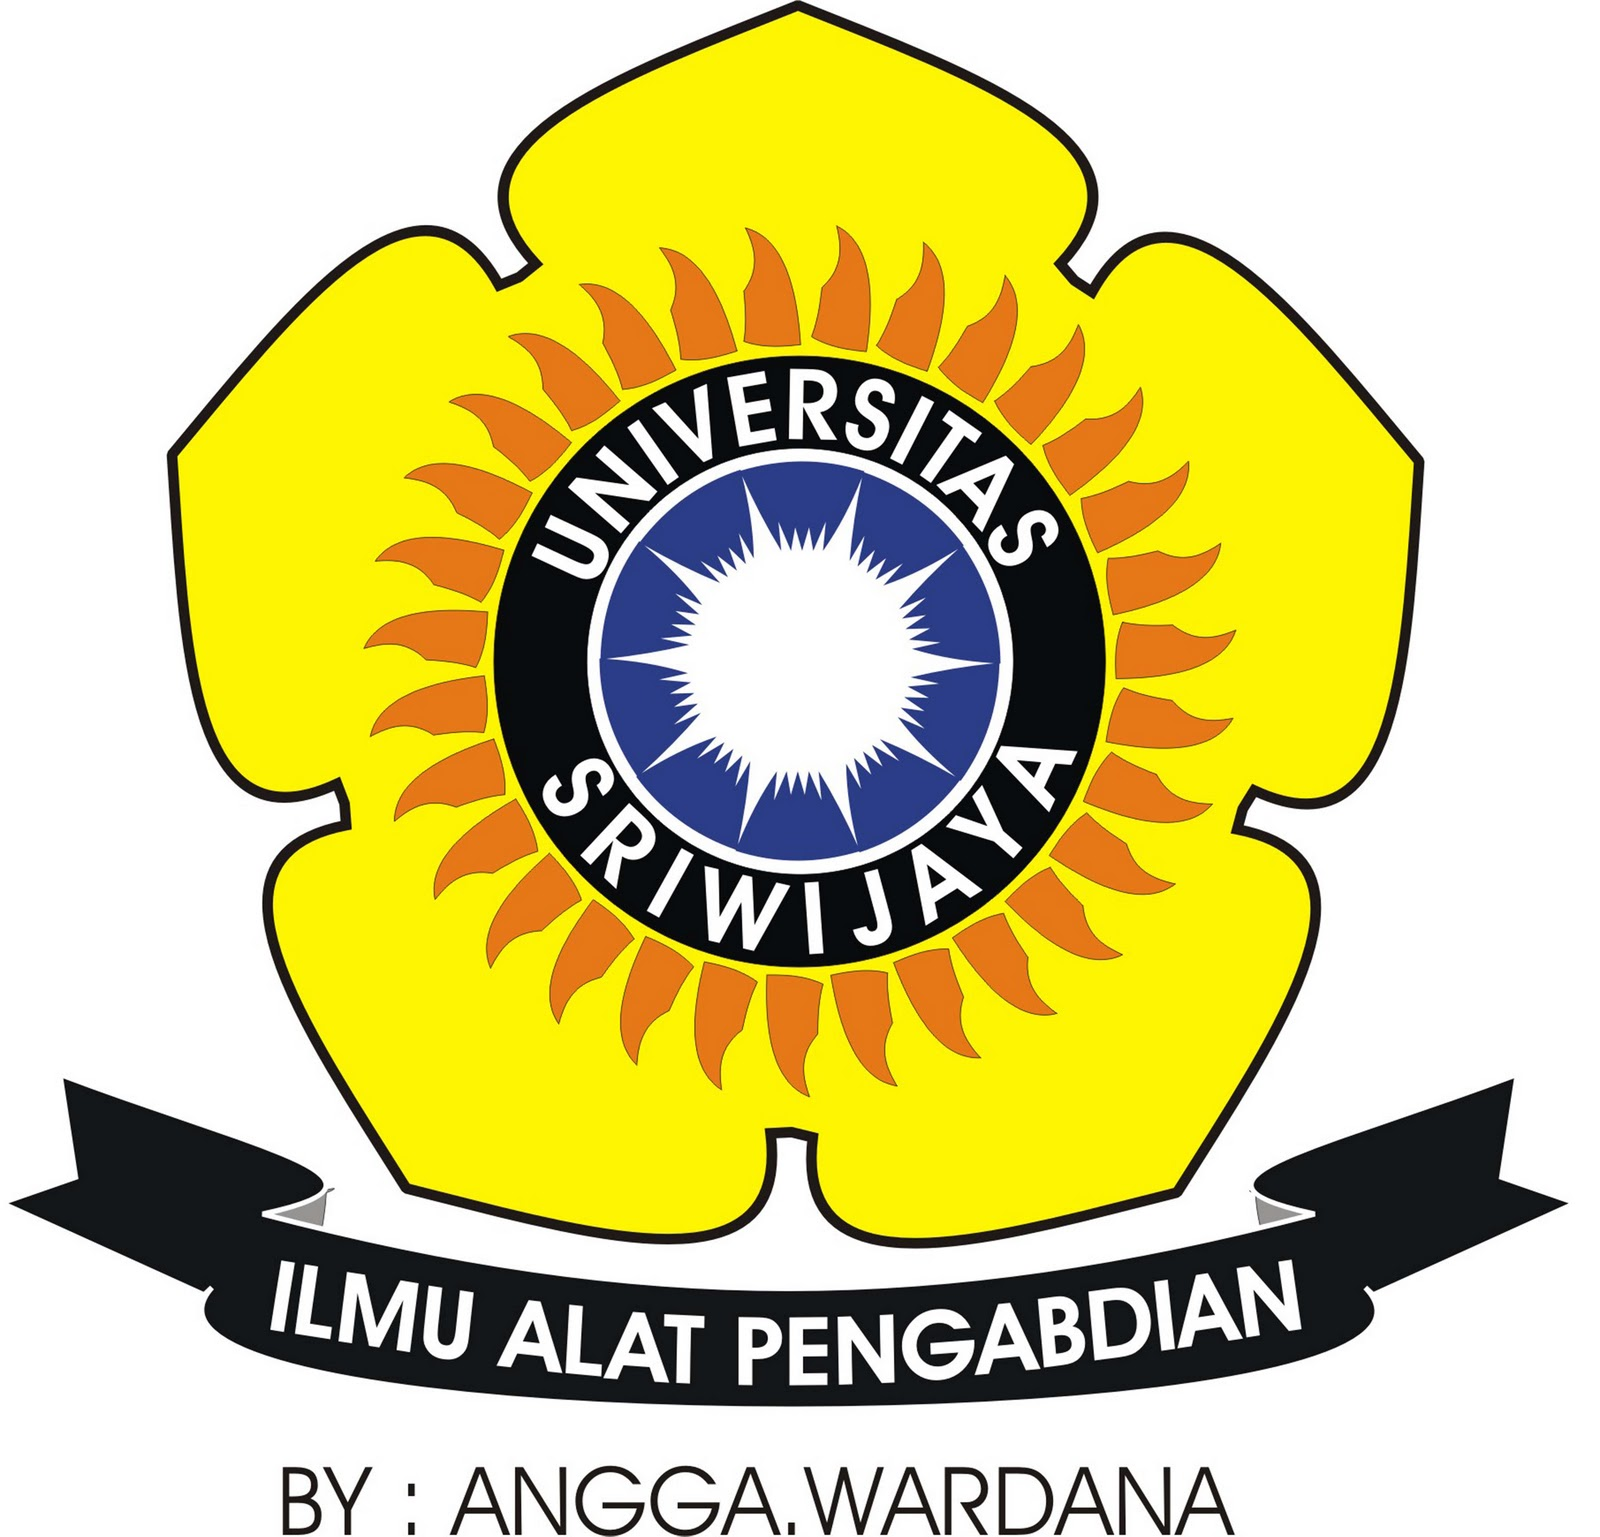 Gambar Lambang Universitas Sriwijaya  Koleksi Gambar HD